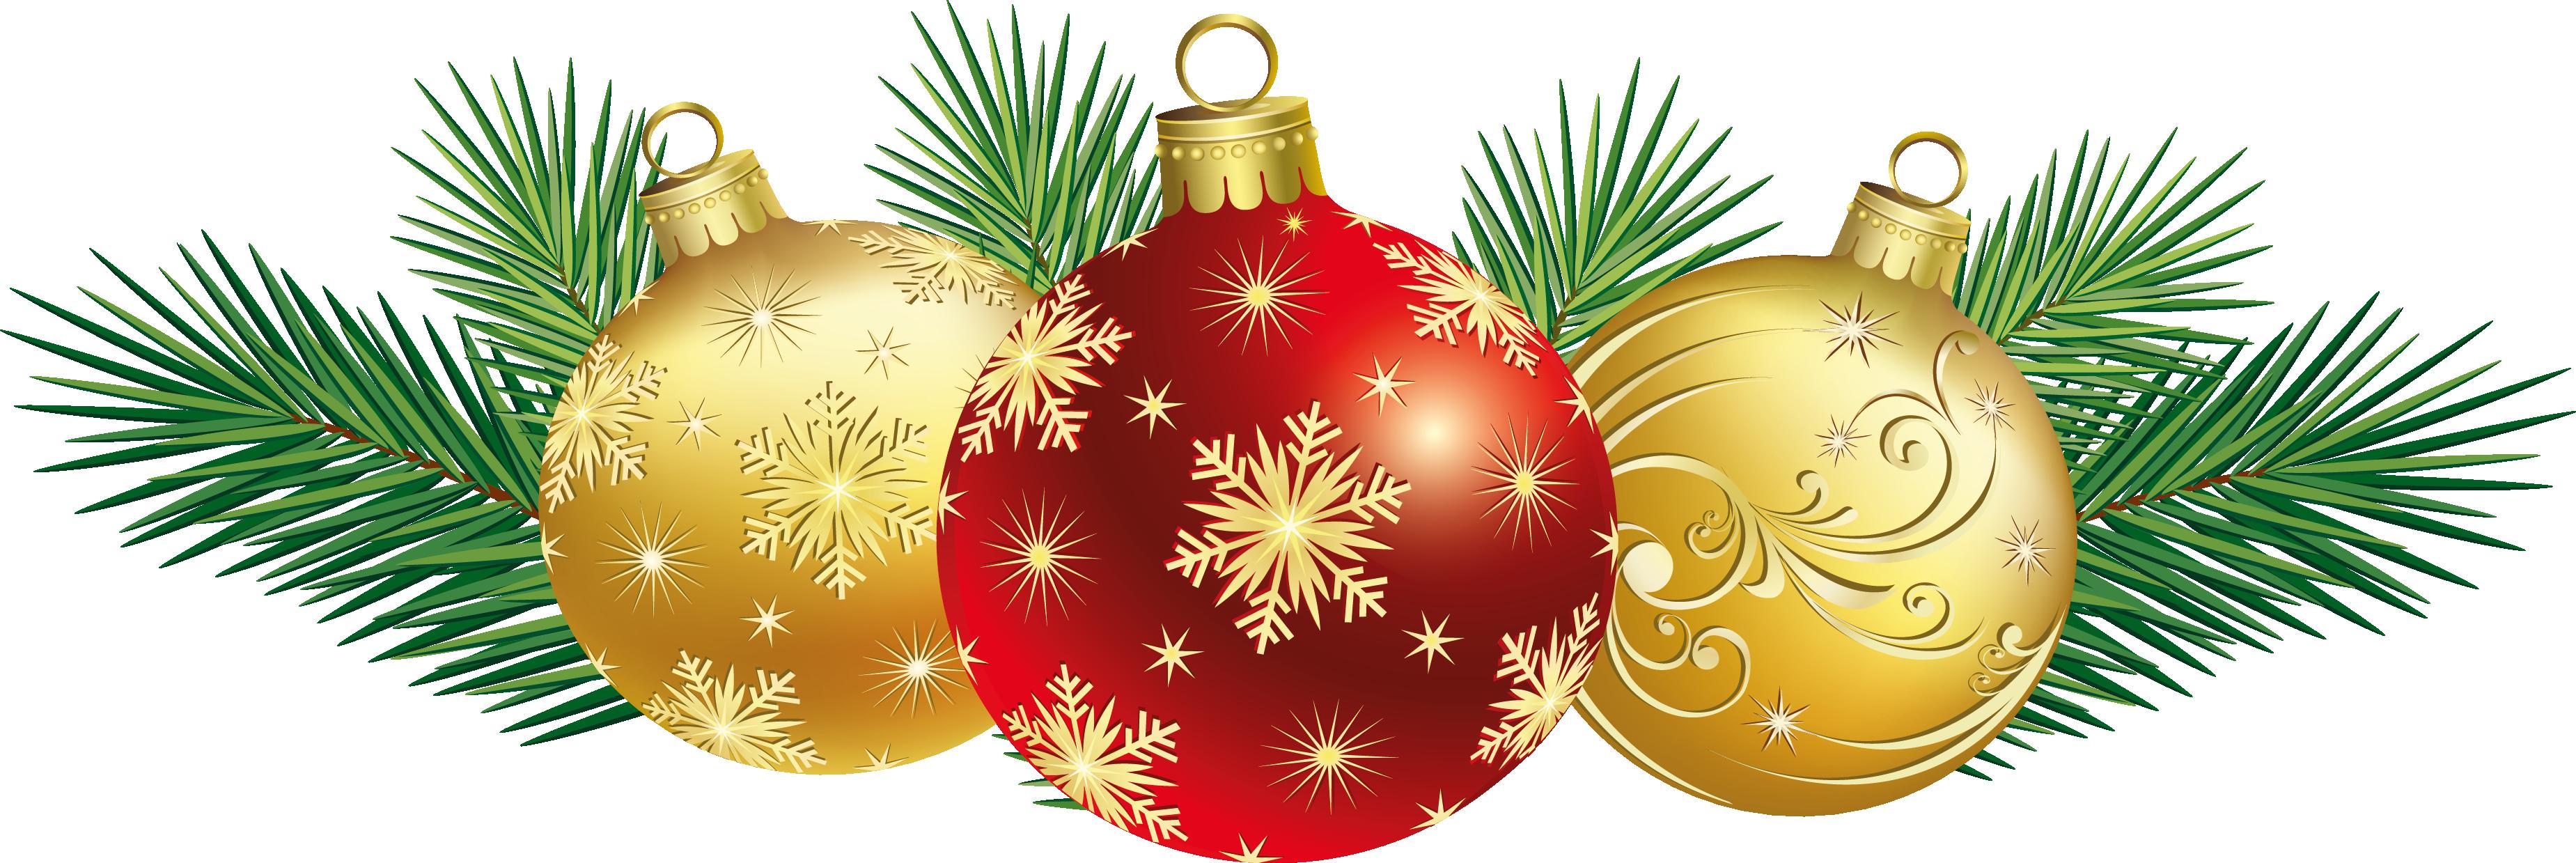 xmas images free png transparent xmas images png images pluspng rh pluspng com free clipart for christmas decorations free clipart for christmas